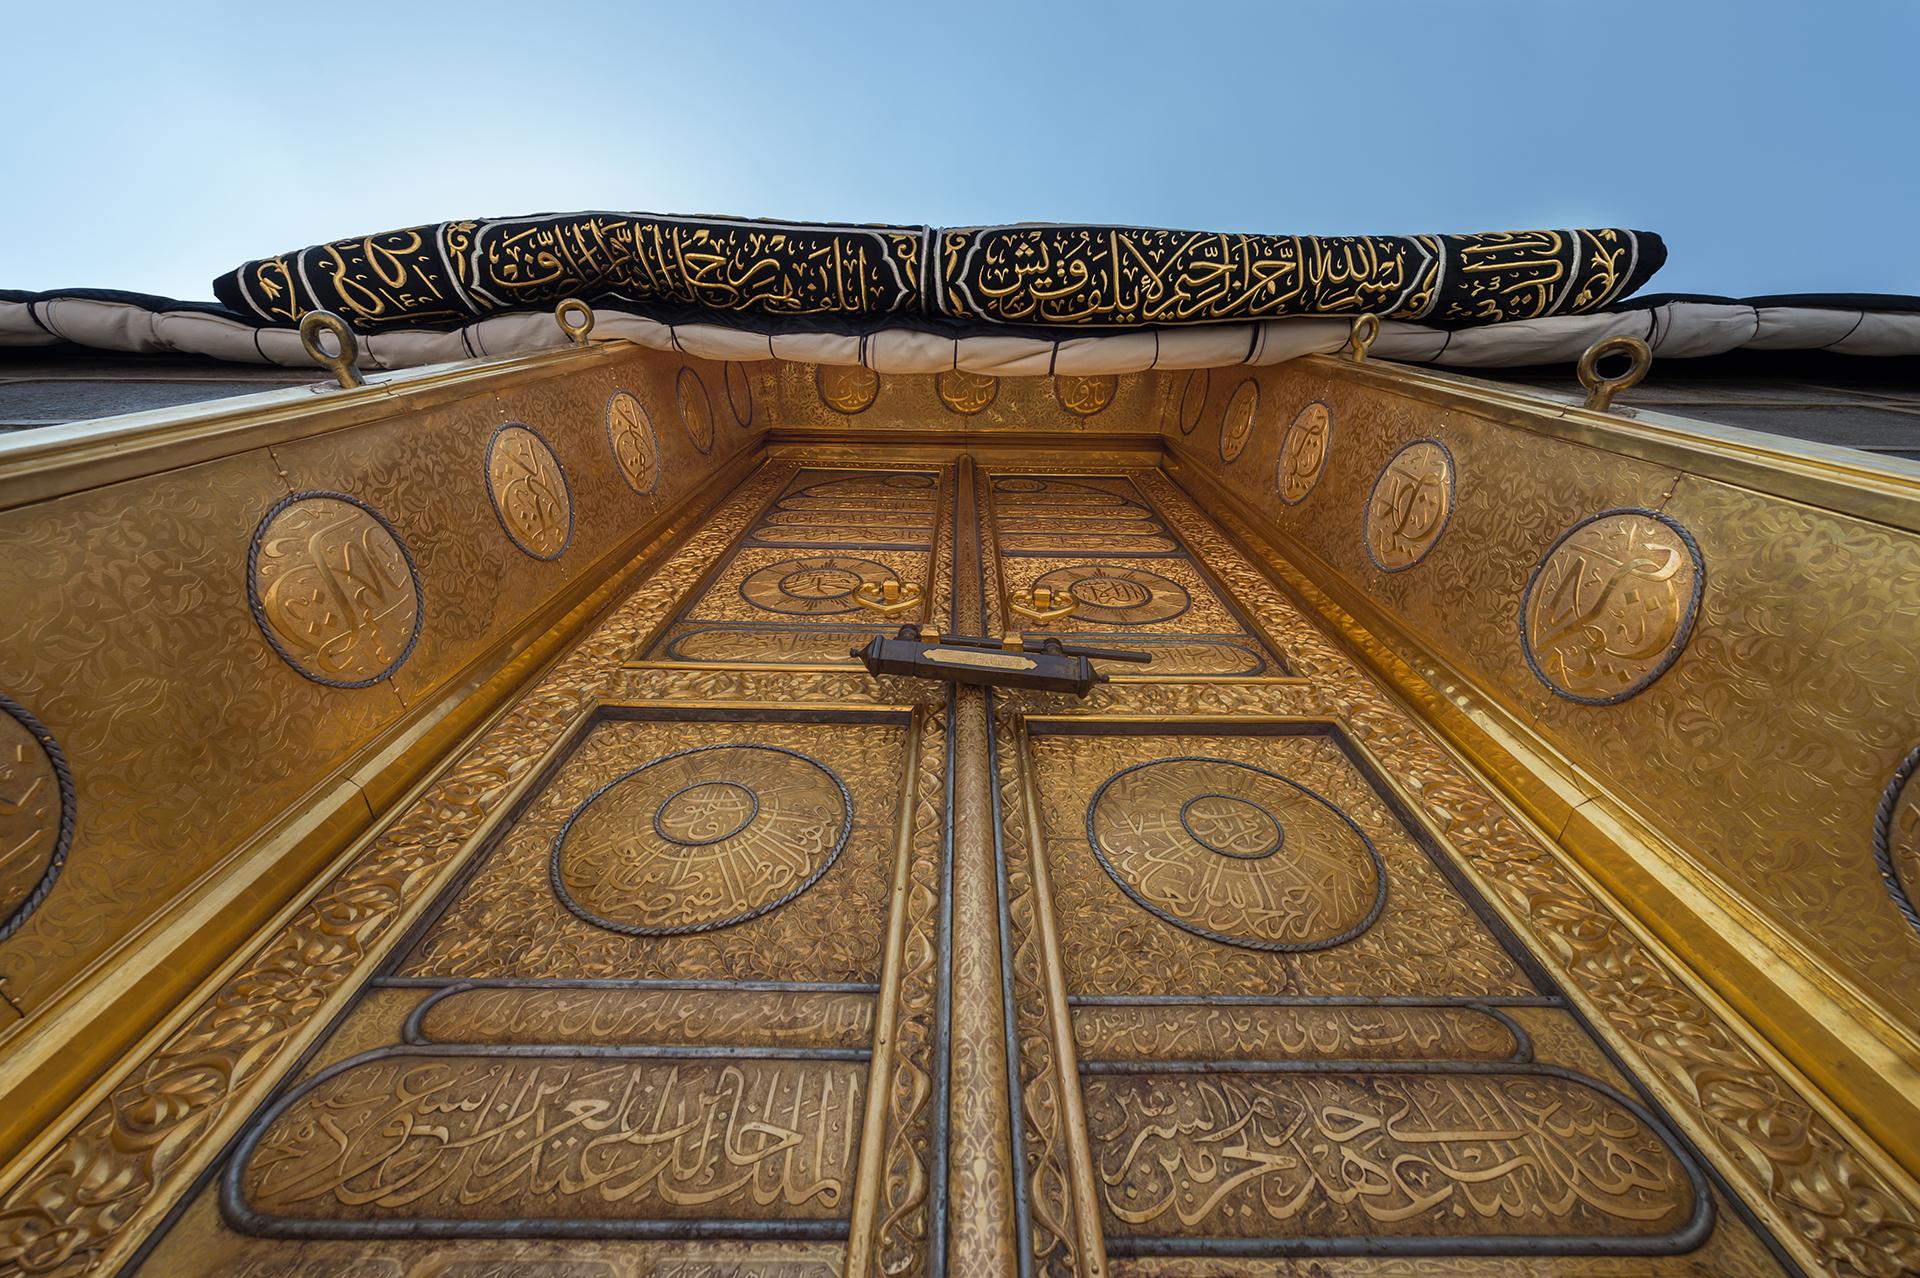 Arabia Pictures